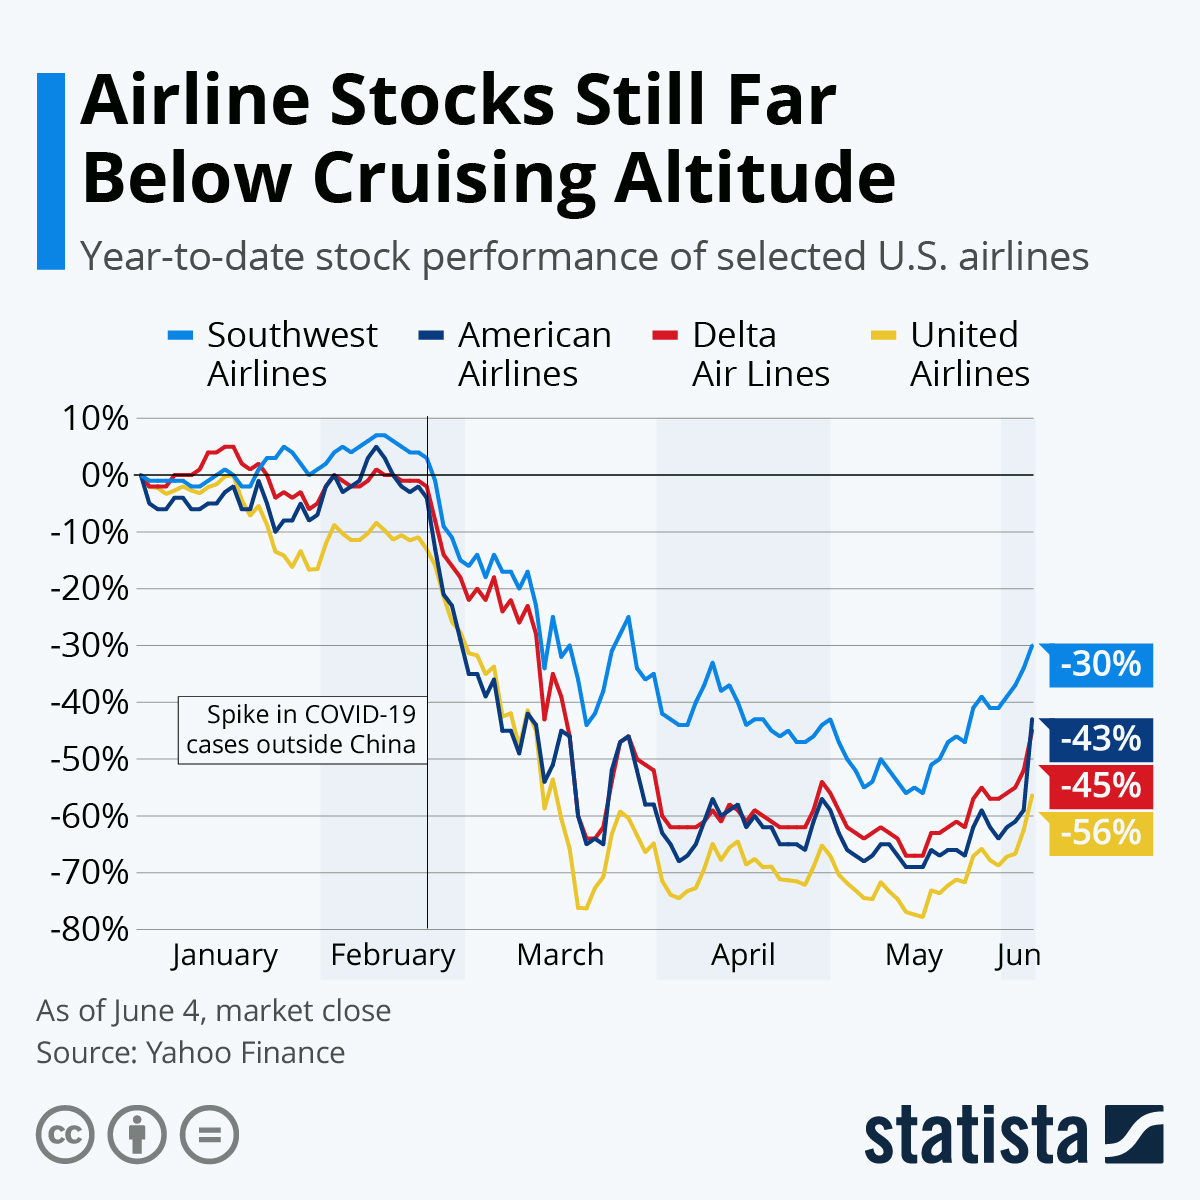 Airline Stocks Still Far Below Cruising Altitude  #infographic